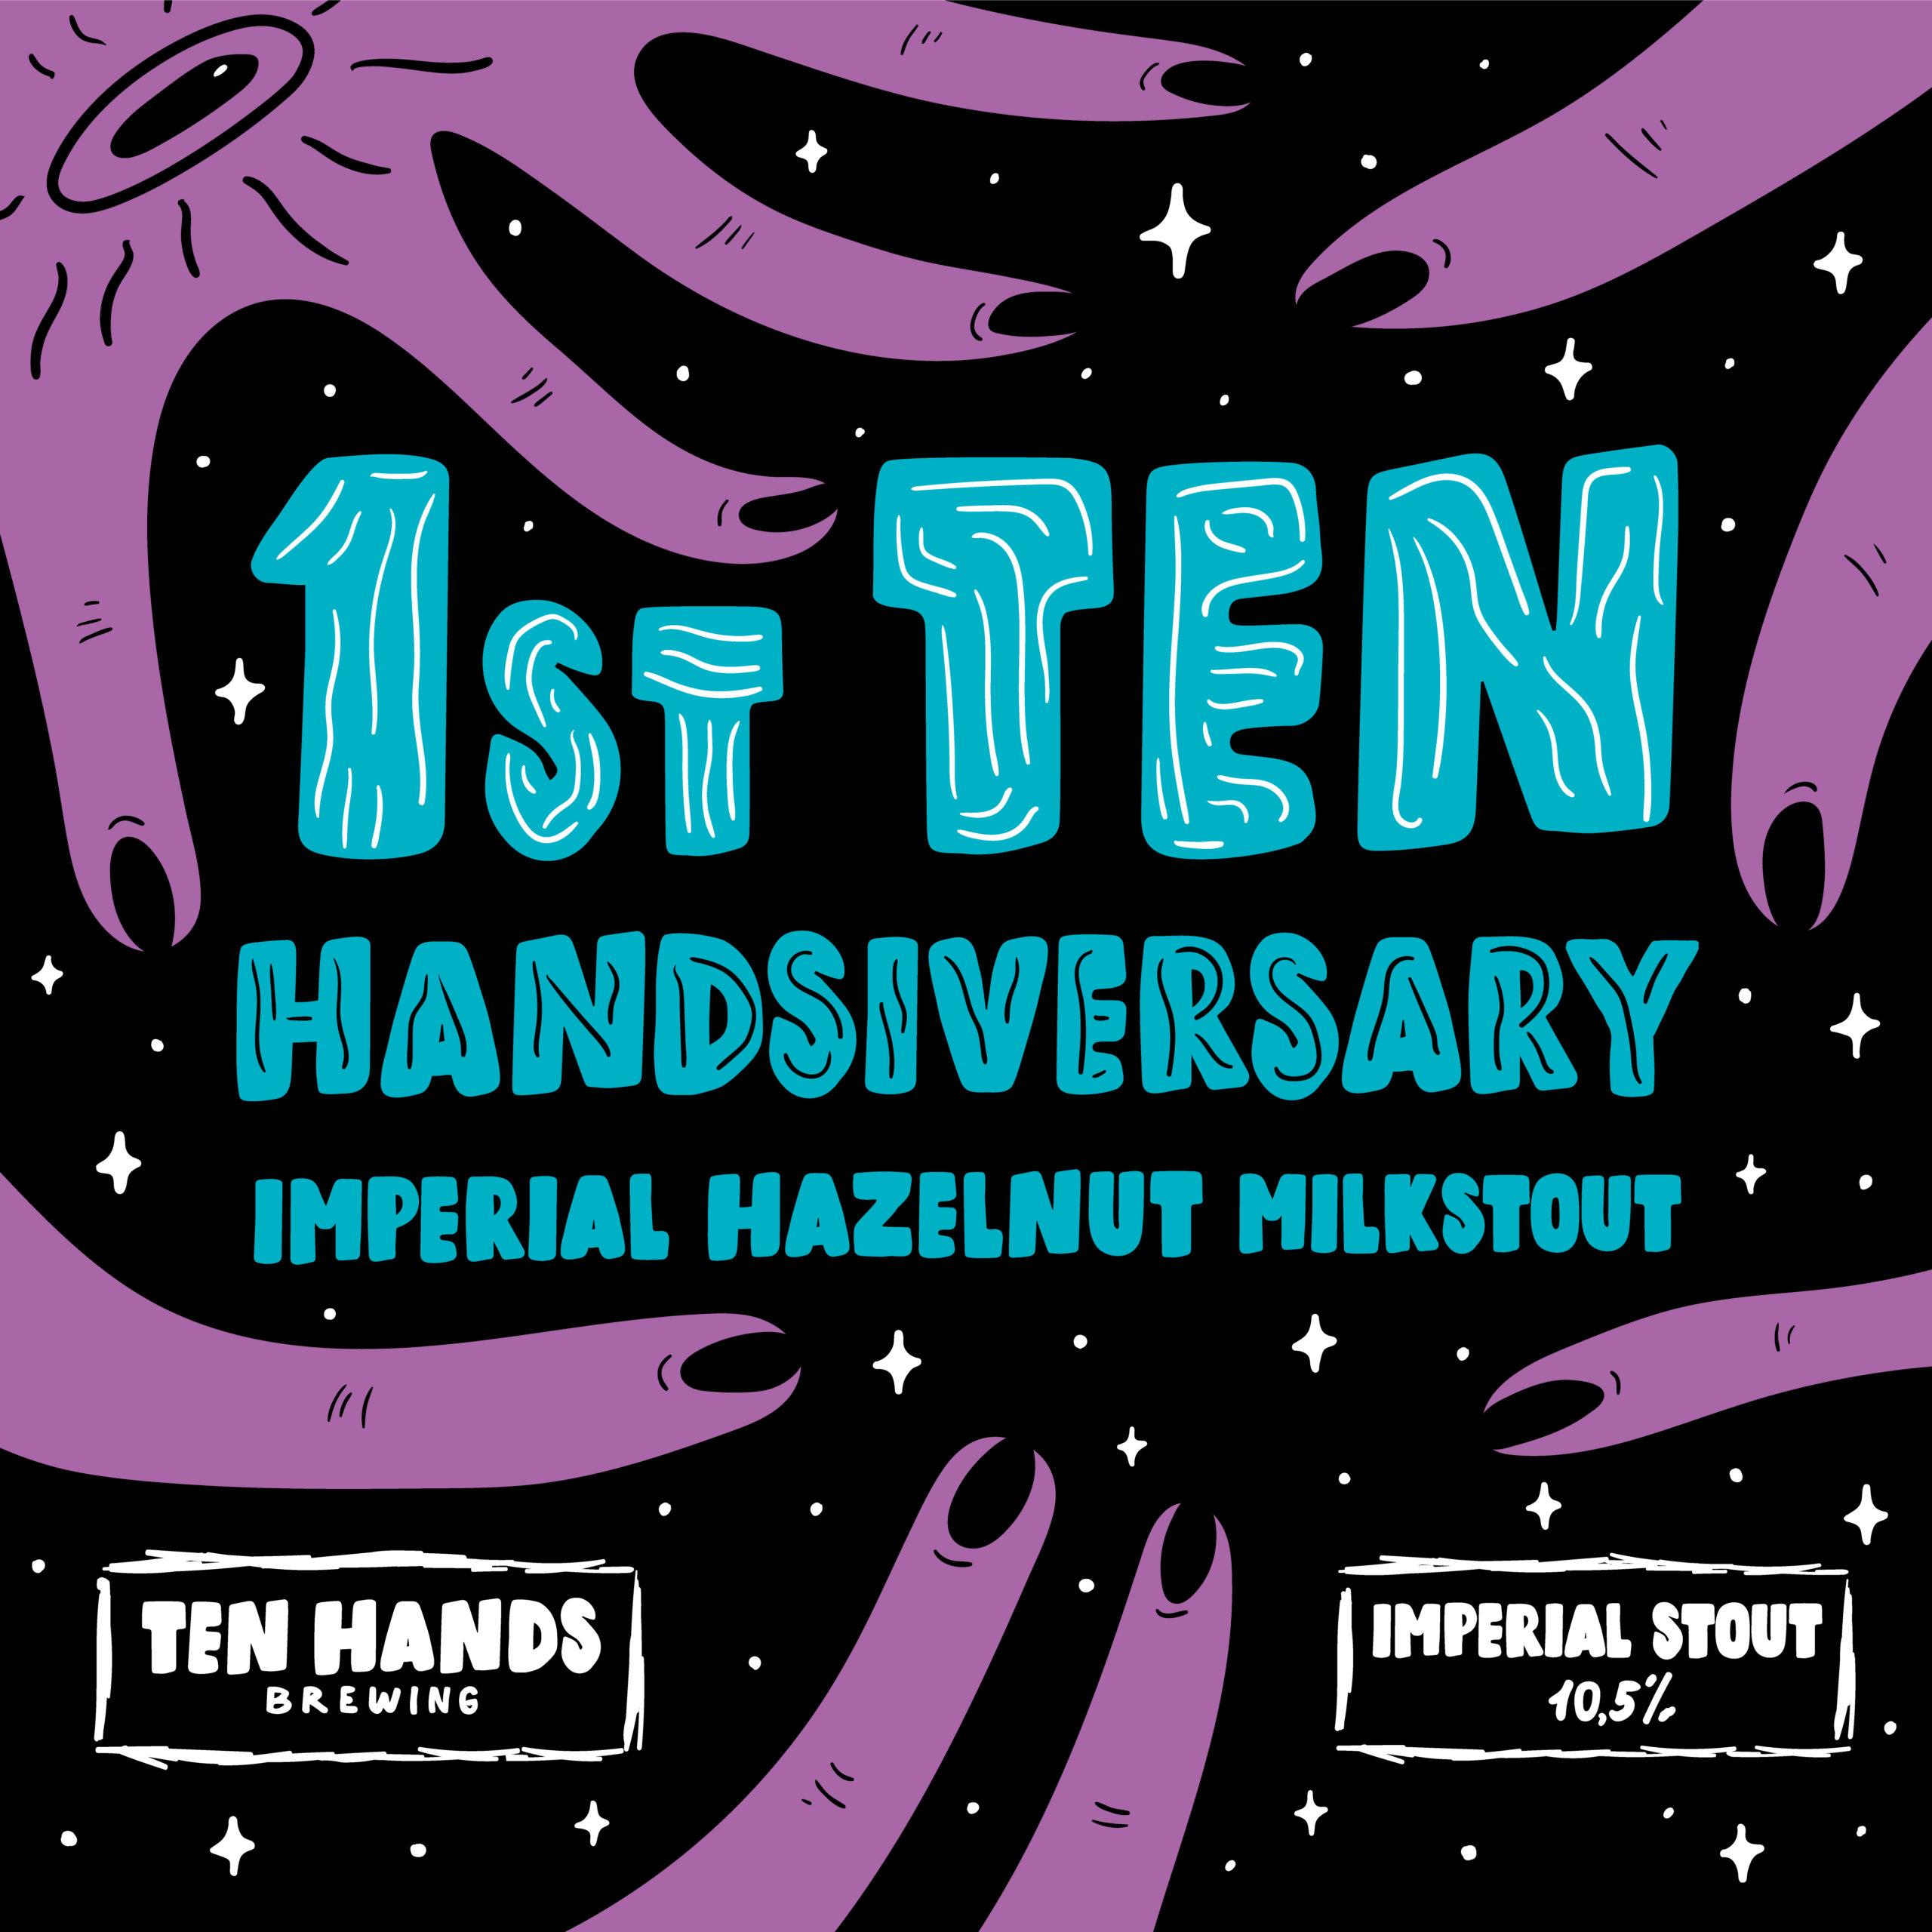 1st Ten Handsiversary Imperial Hazelnut Milkstout